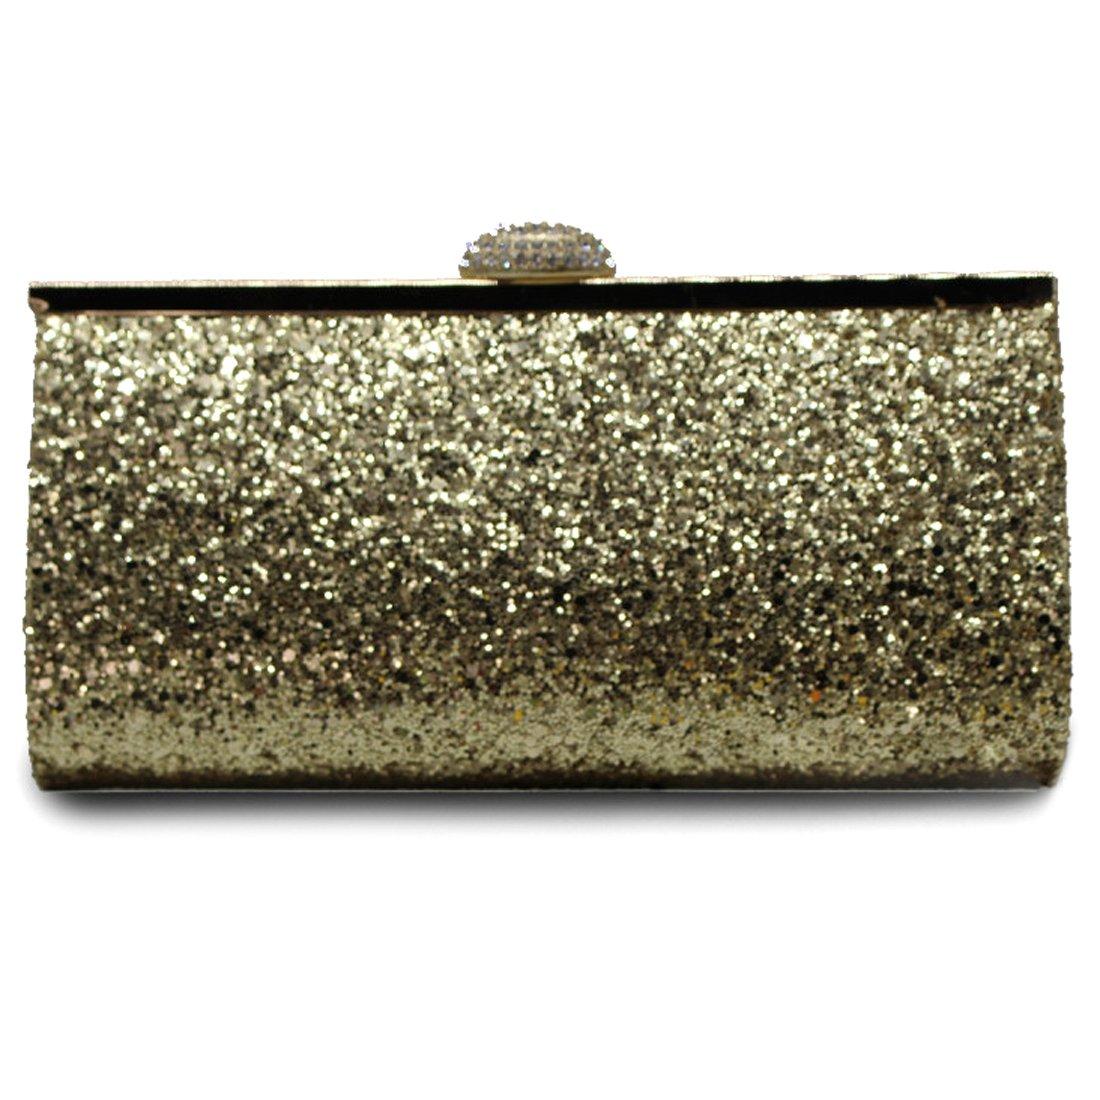 UNYU Evening Bag, Damen Clutch UNYU Evening Bag gold